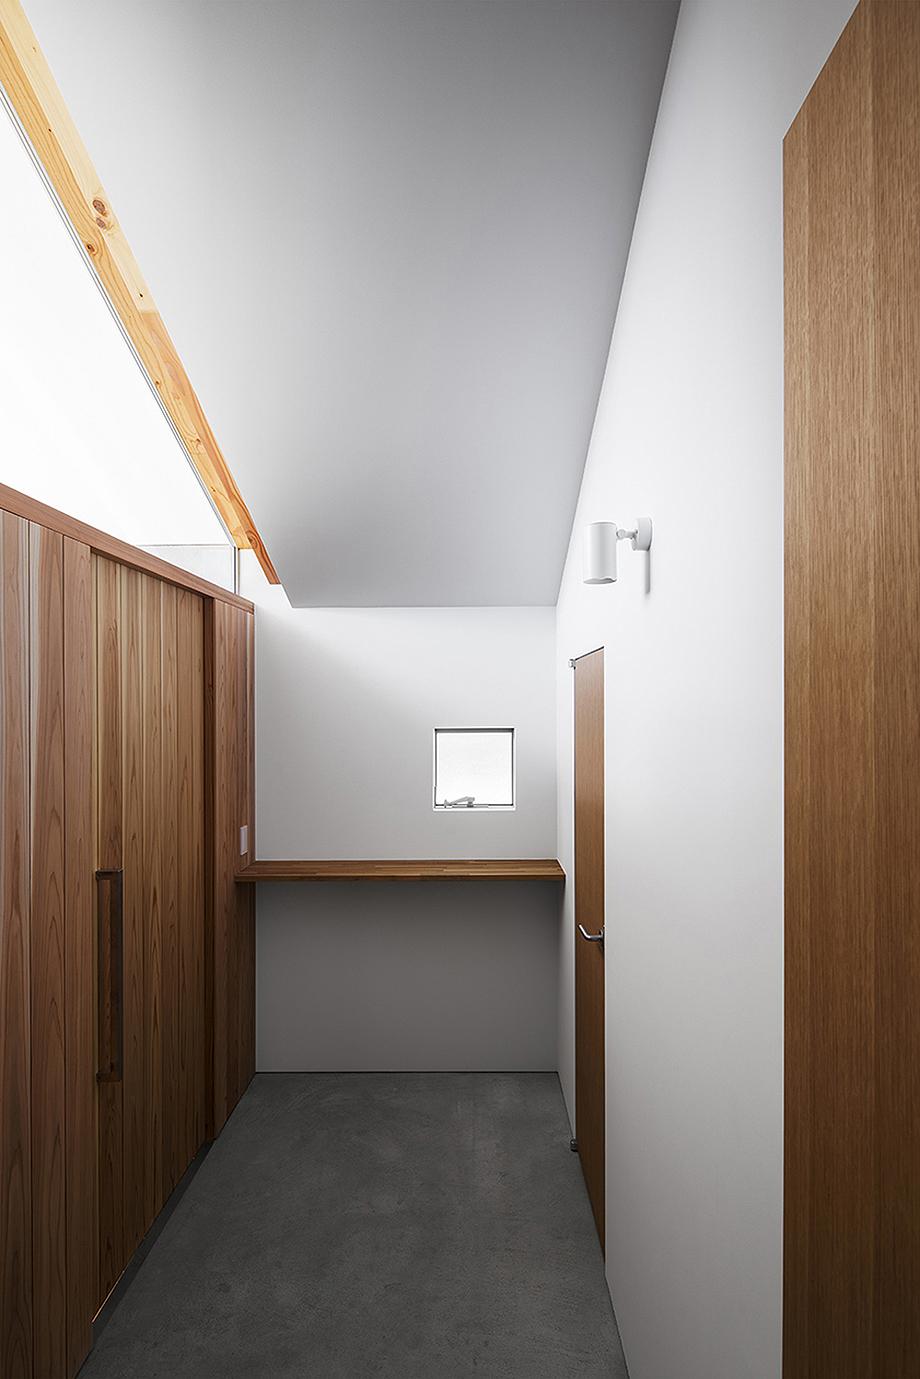 casa en ohue de daisaku hanamoto (6)